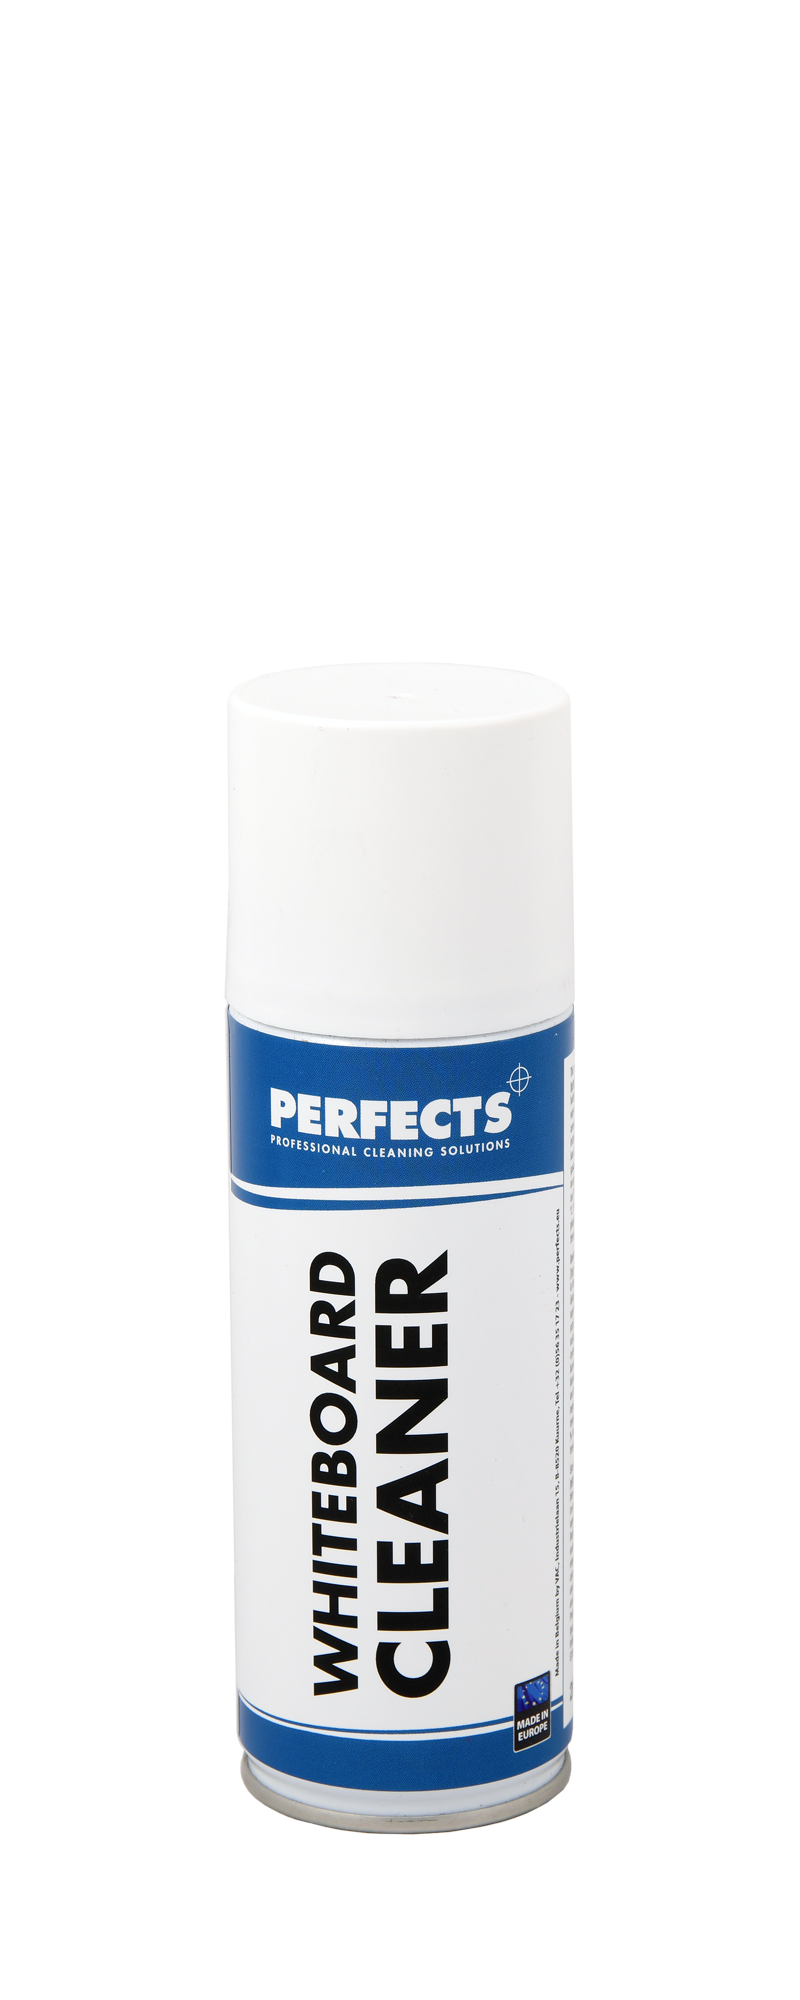 Whiteboard Cleaner Spray